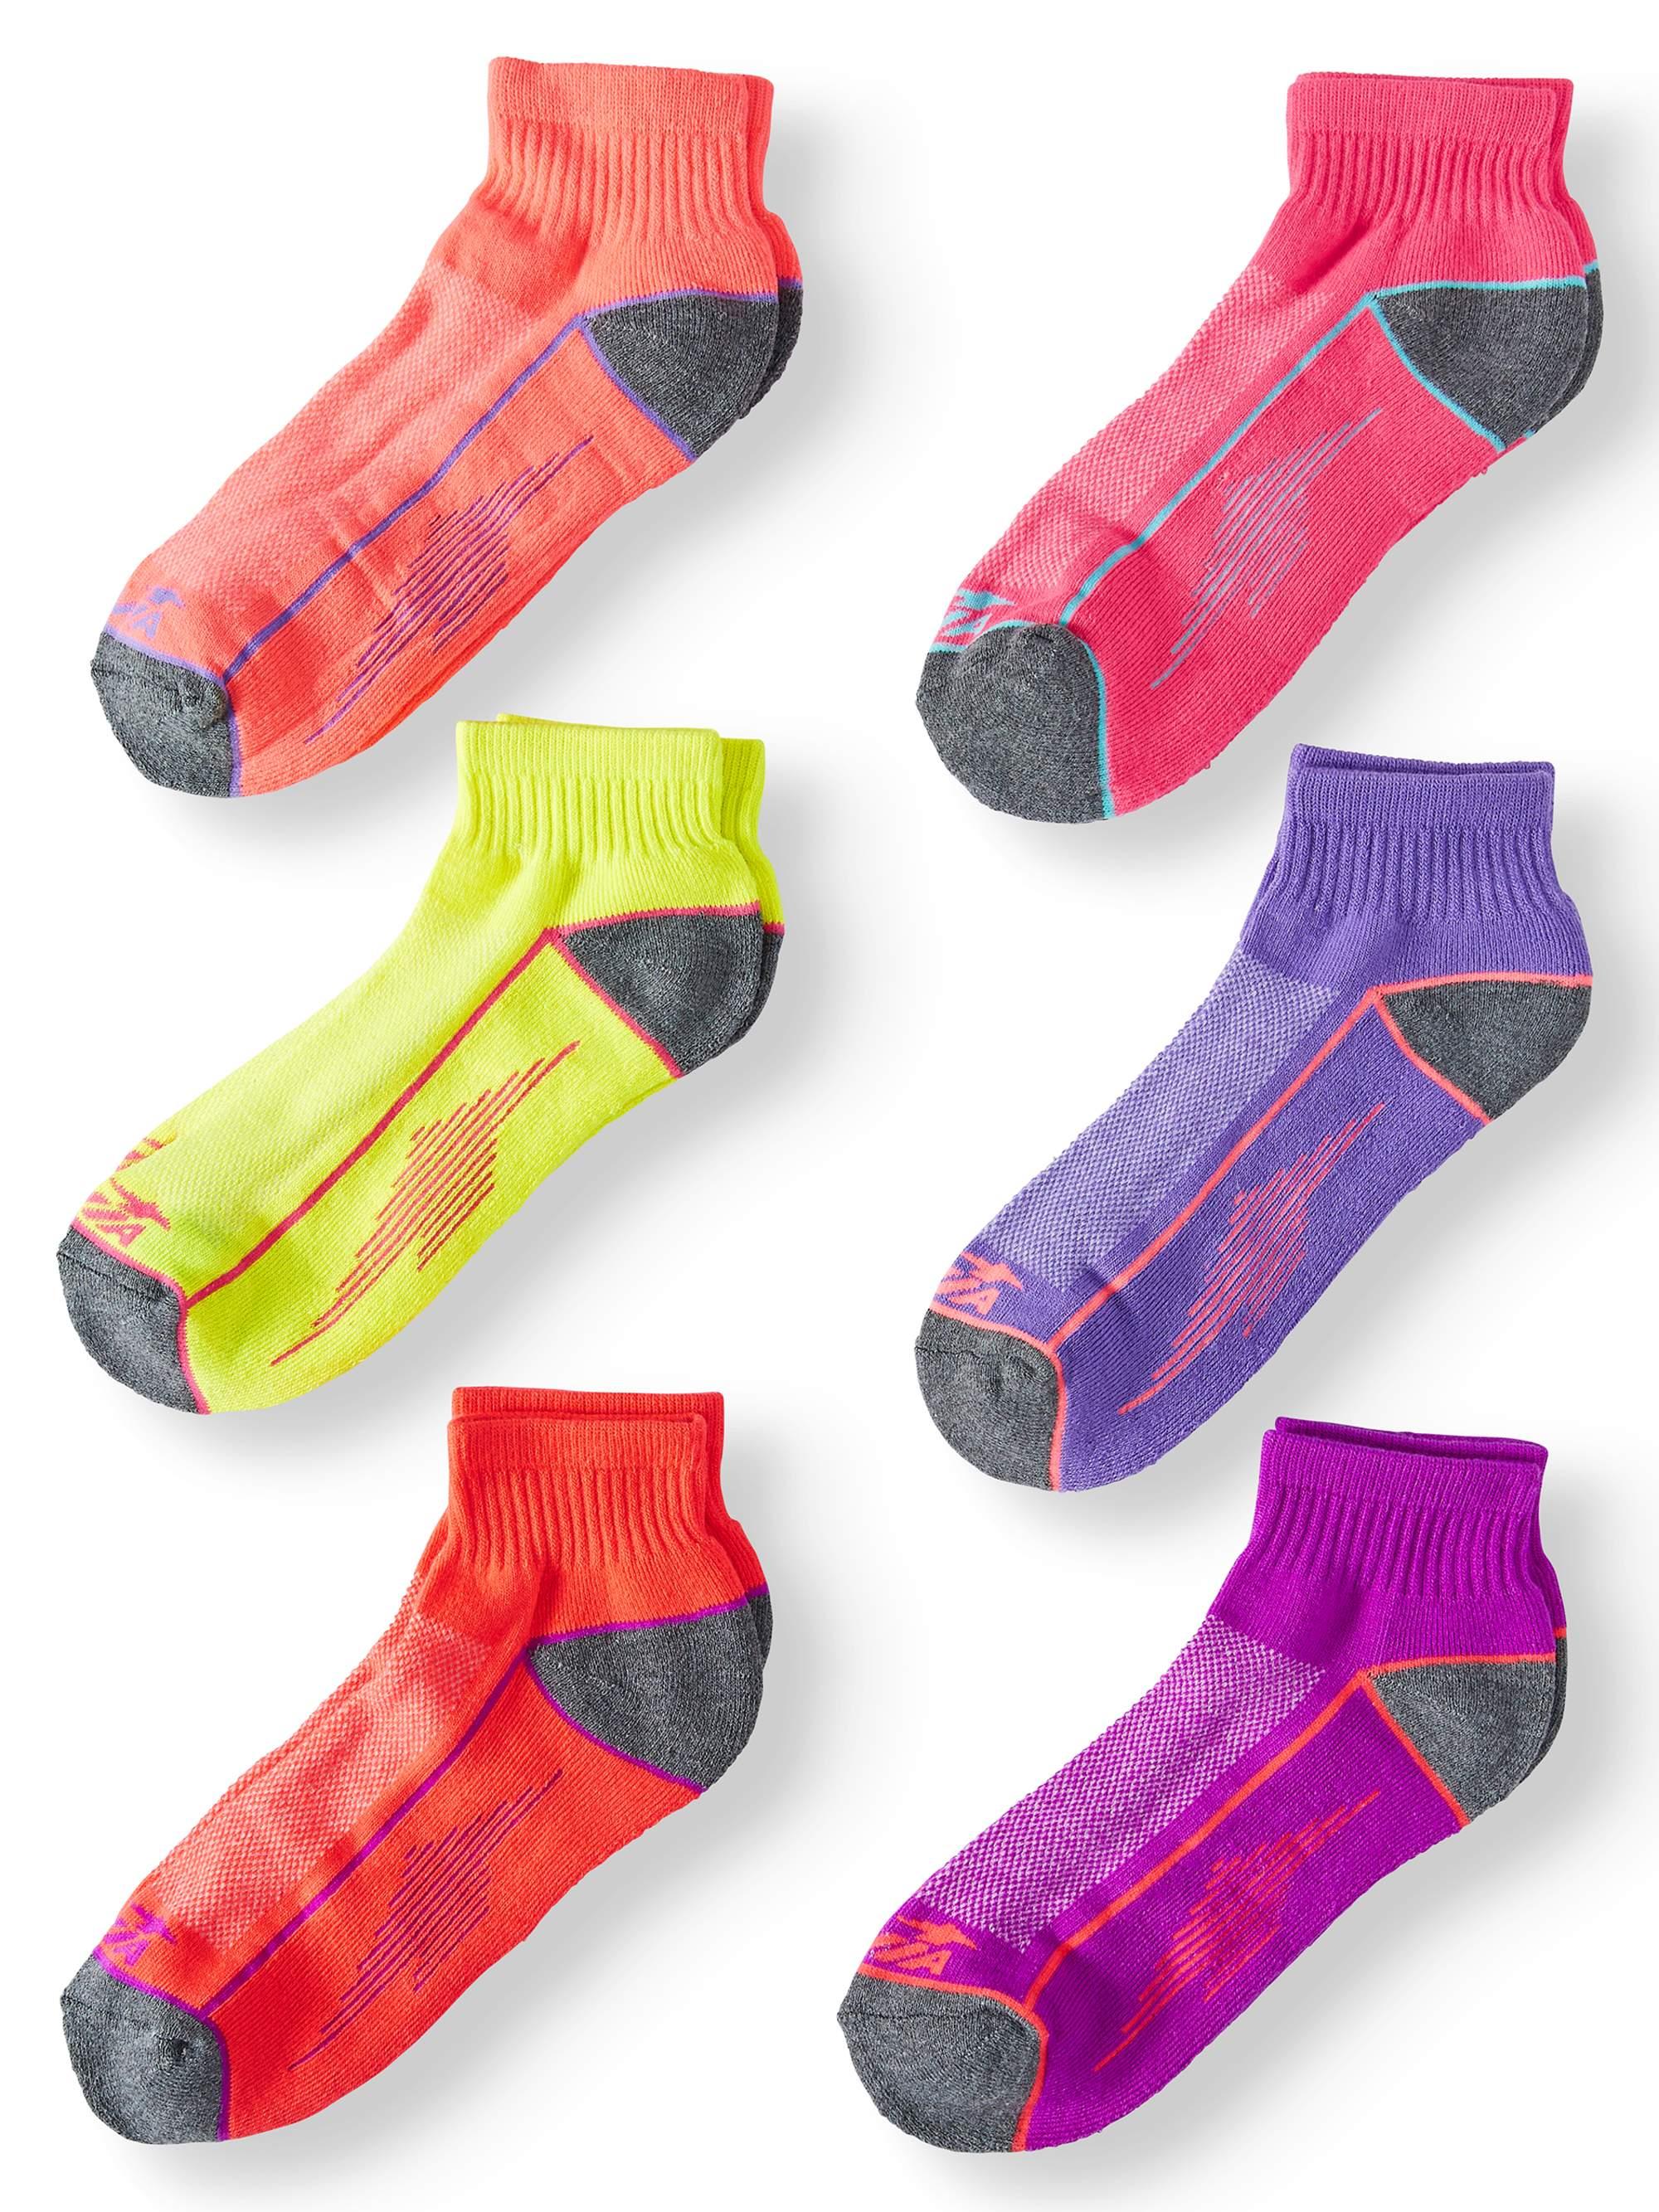 Ladies Cushioned Performance Ankle Socks, 6 Pack